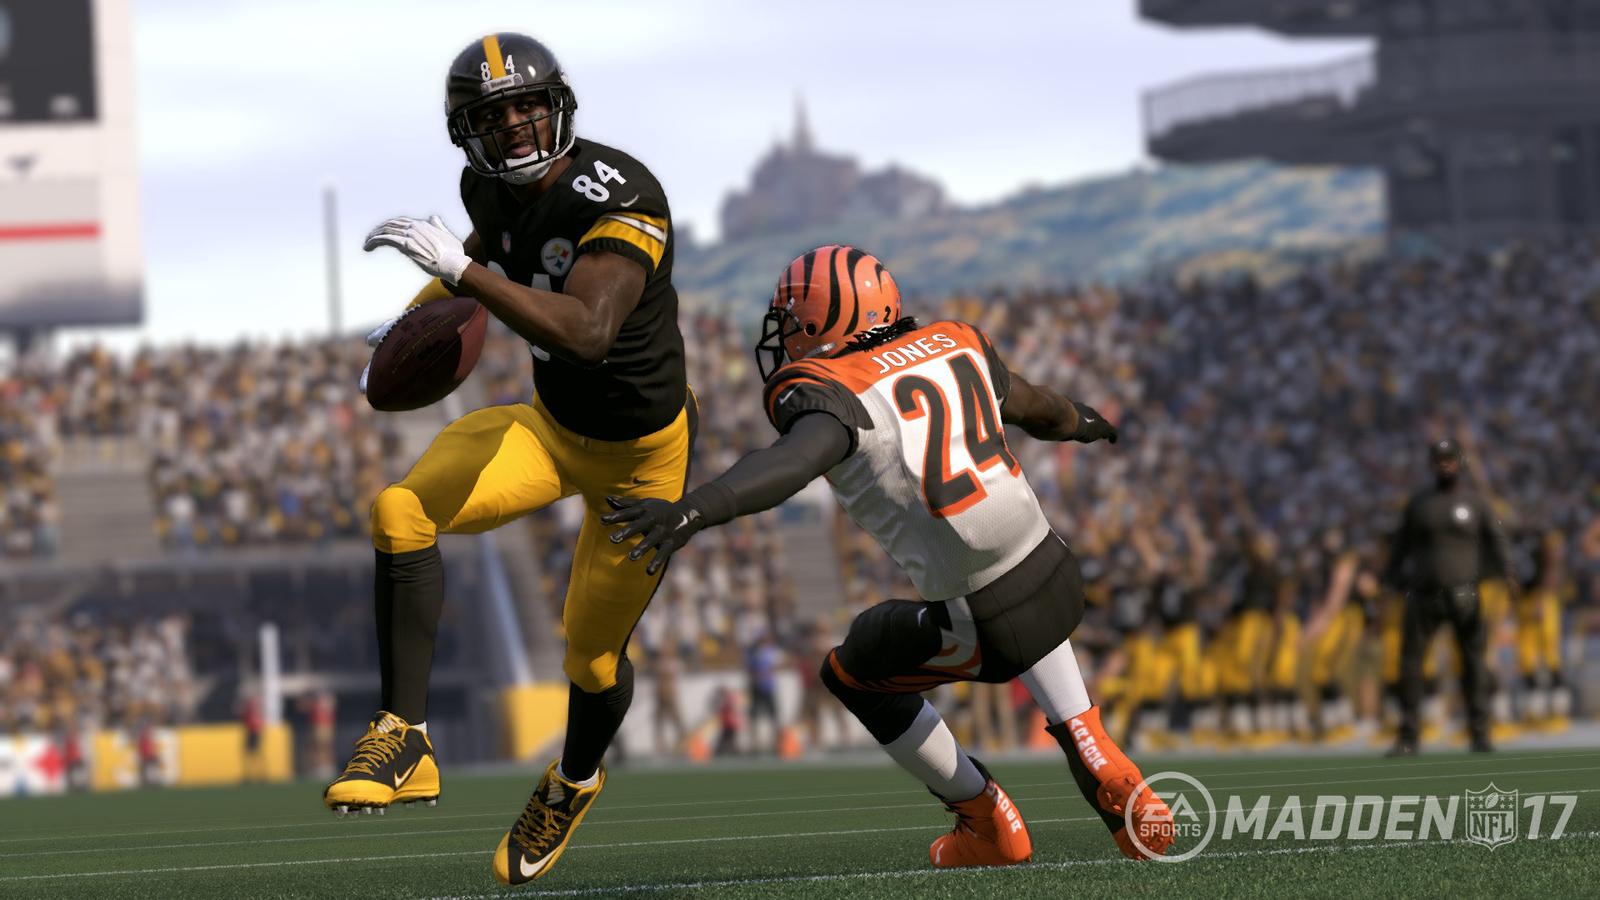 Madden NFL 17 for Xbox 360 image